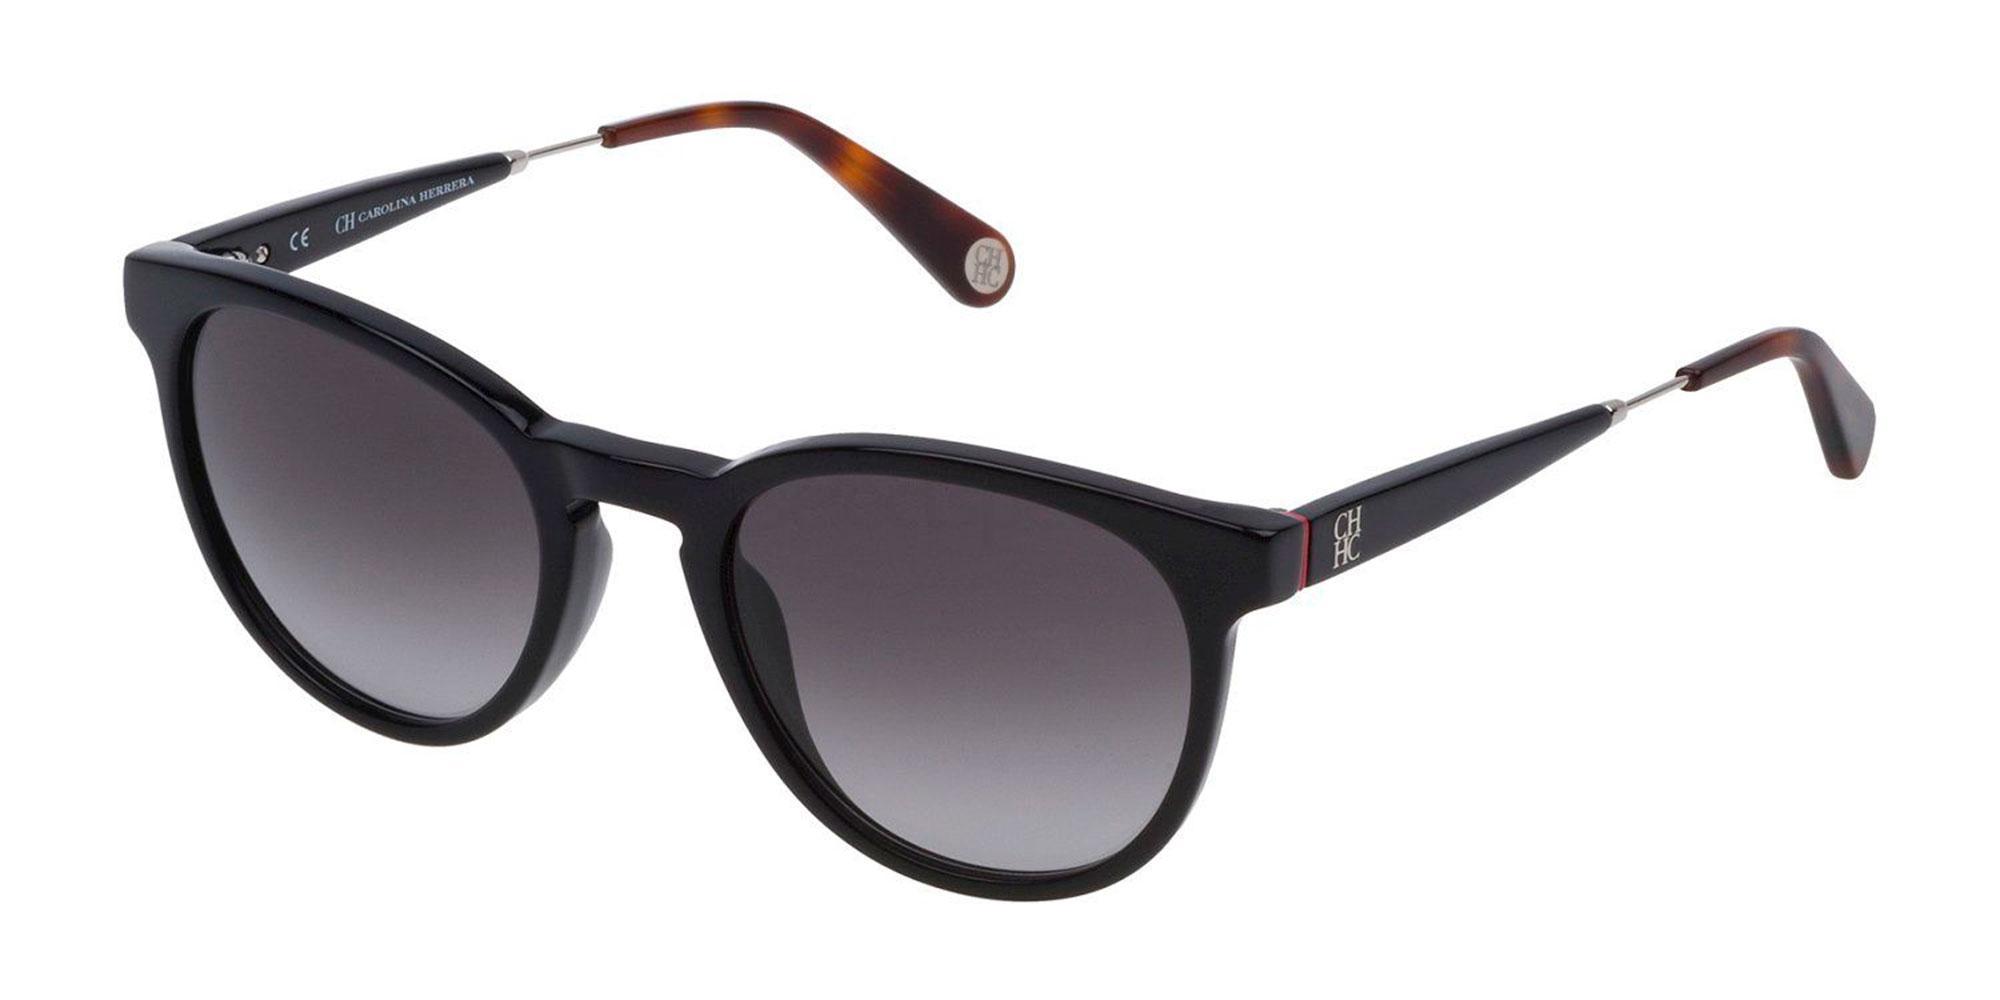 0700 SHE756 Sunglasses, CH Carolina Herrera